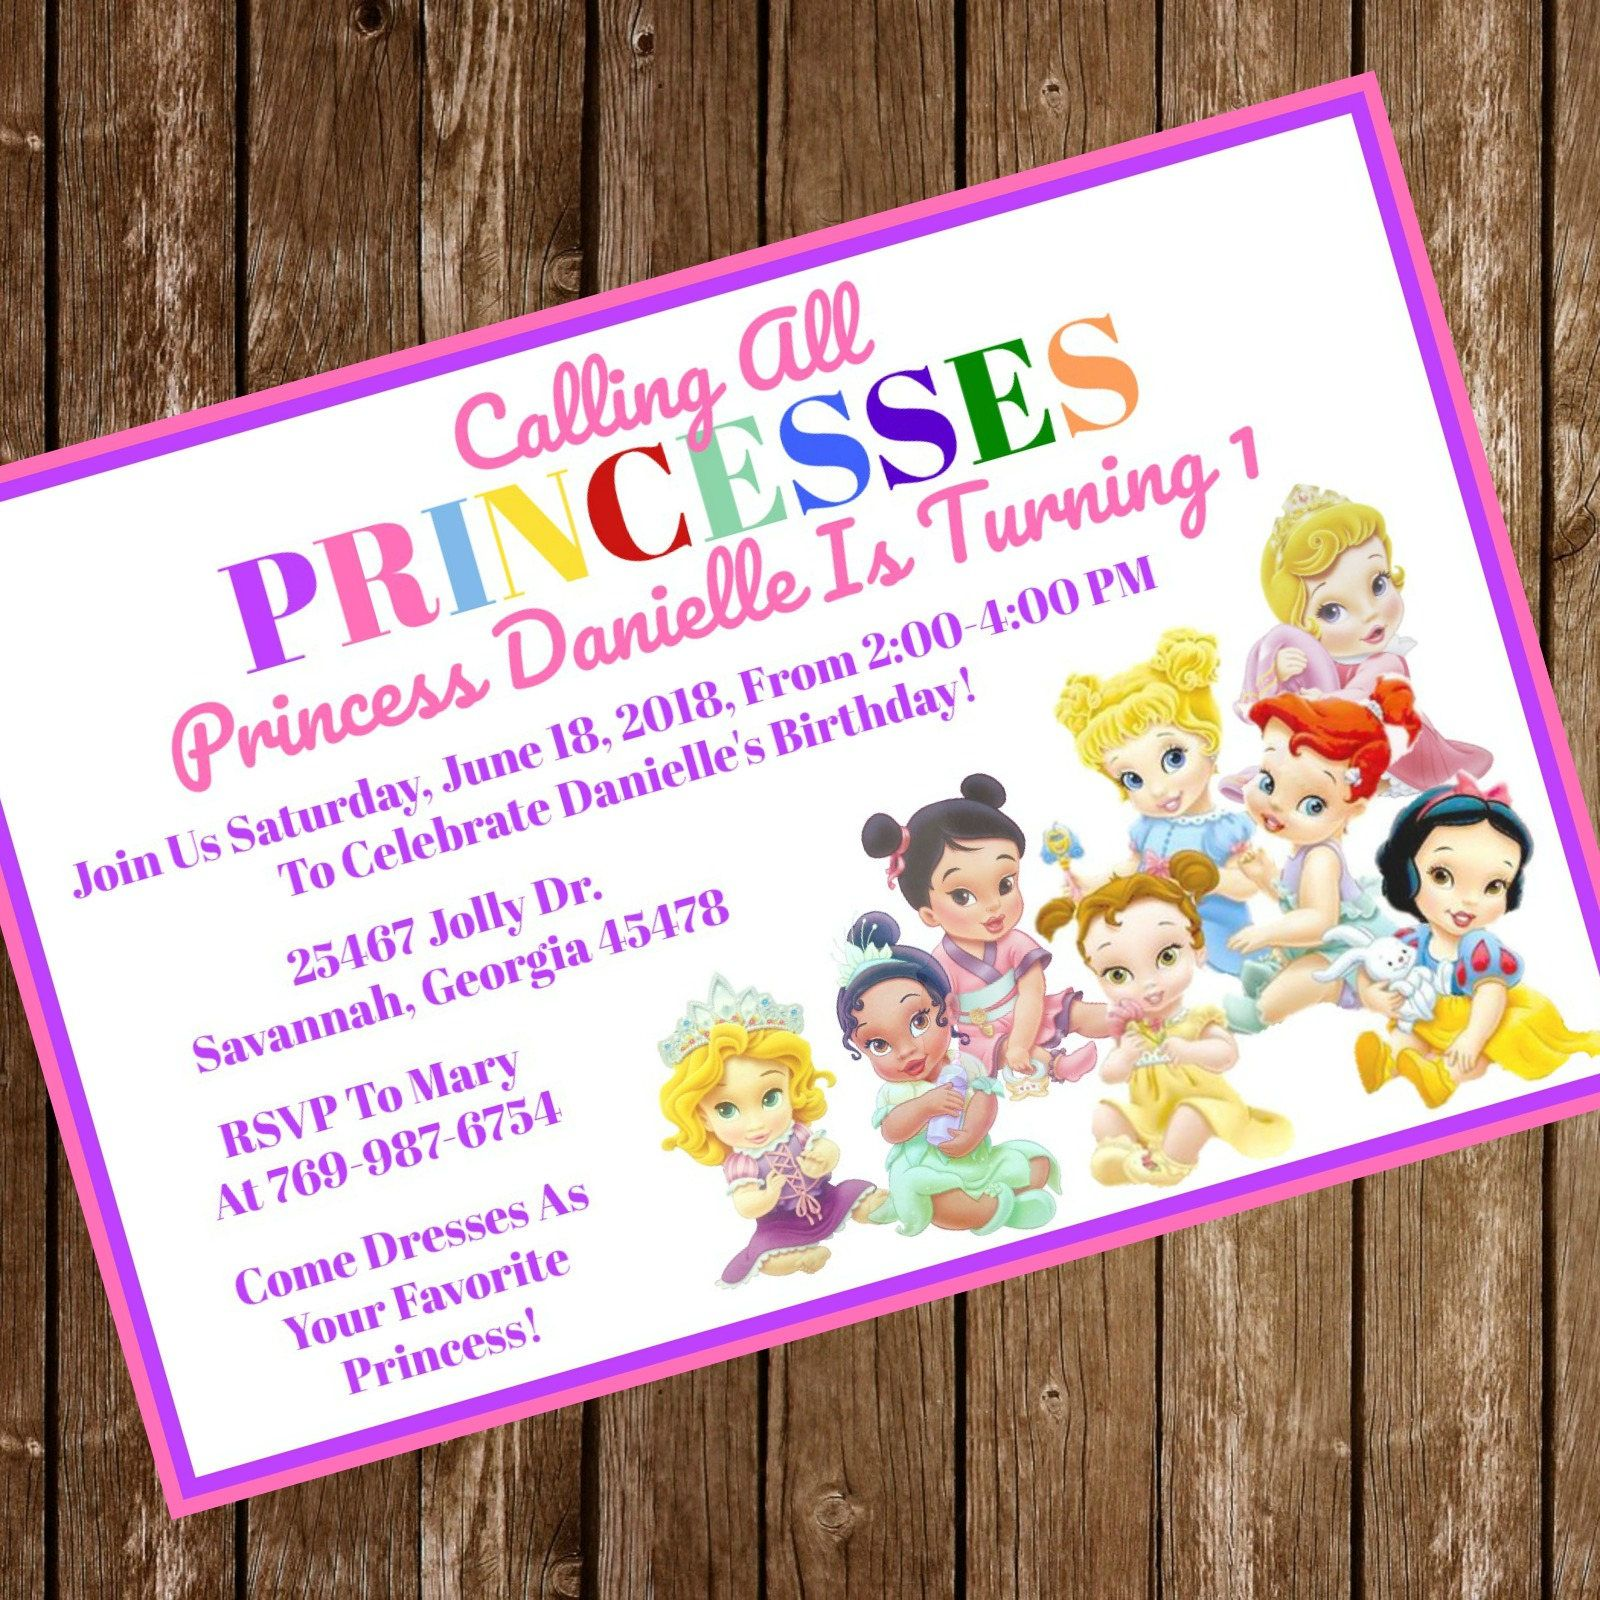 Disney Princess Birthday Party Invitation Download - Disney Princess ...